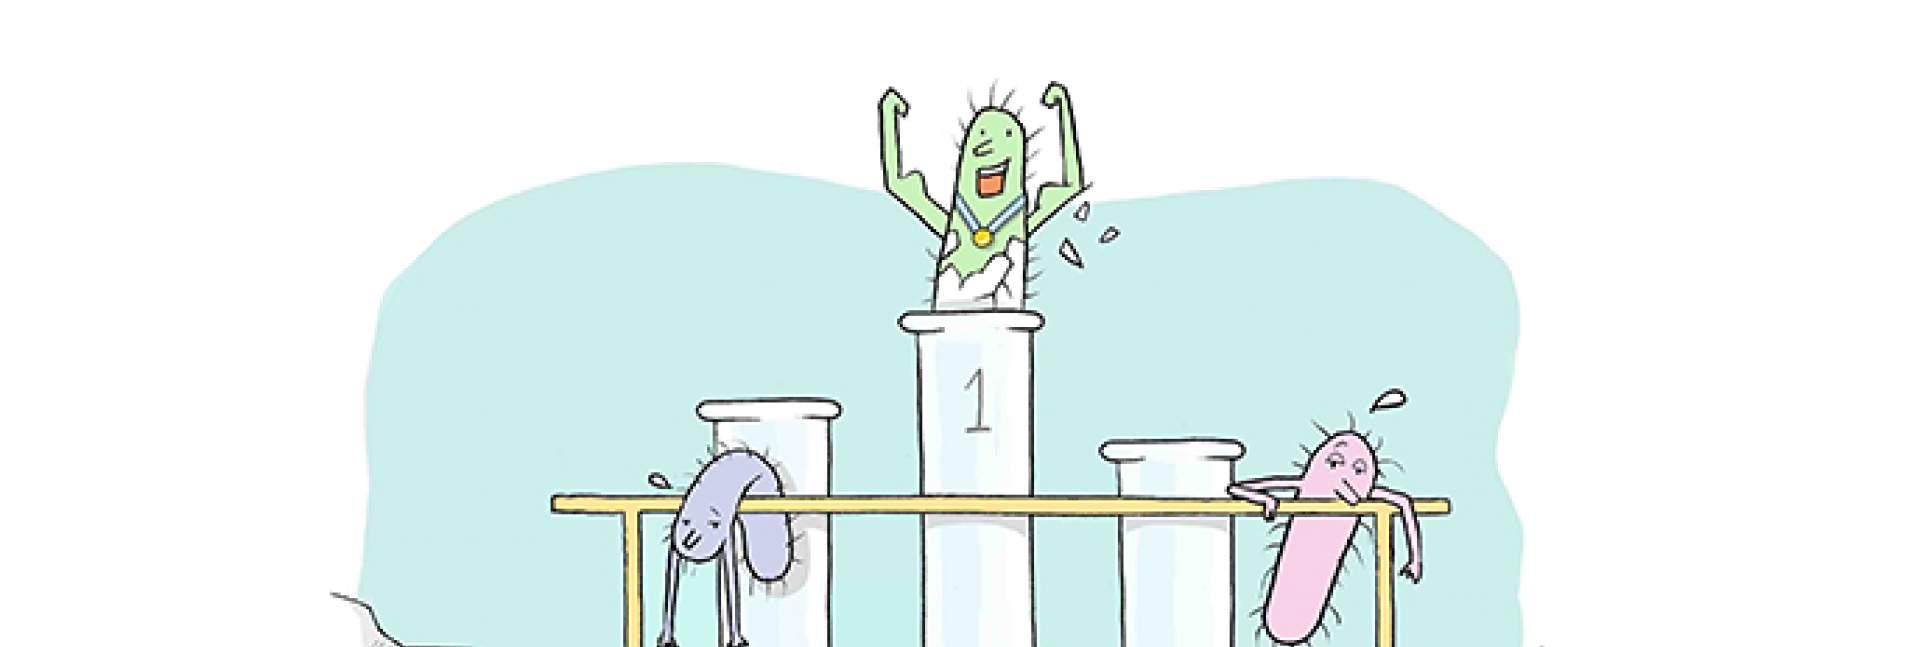 bacteria compete